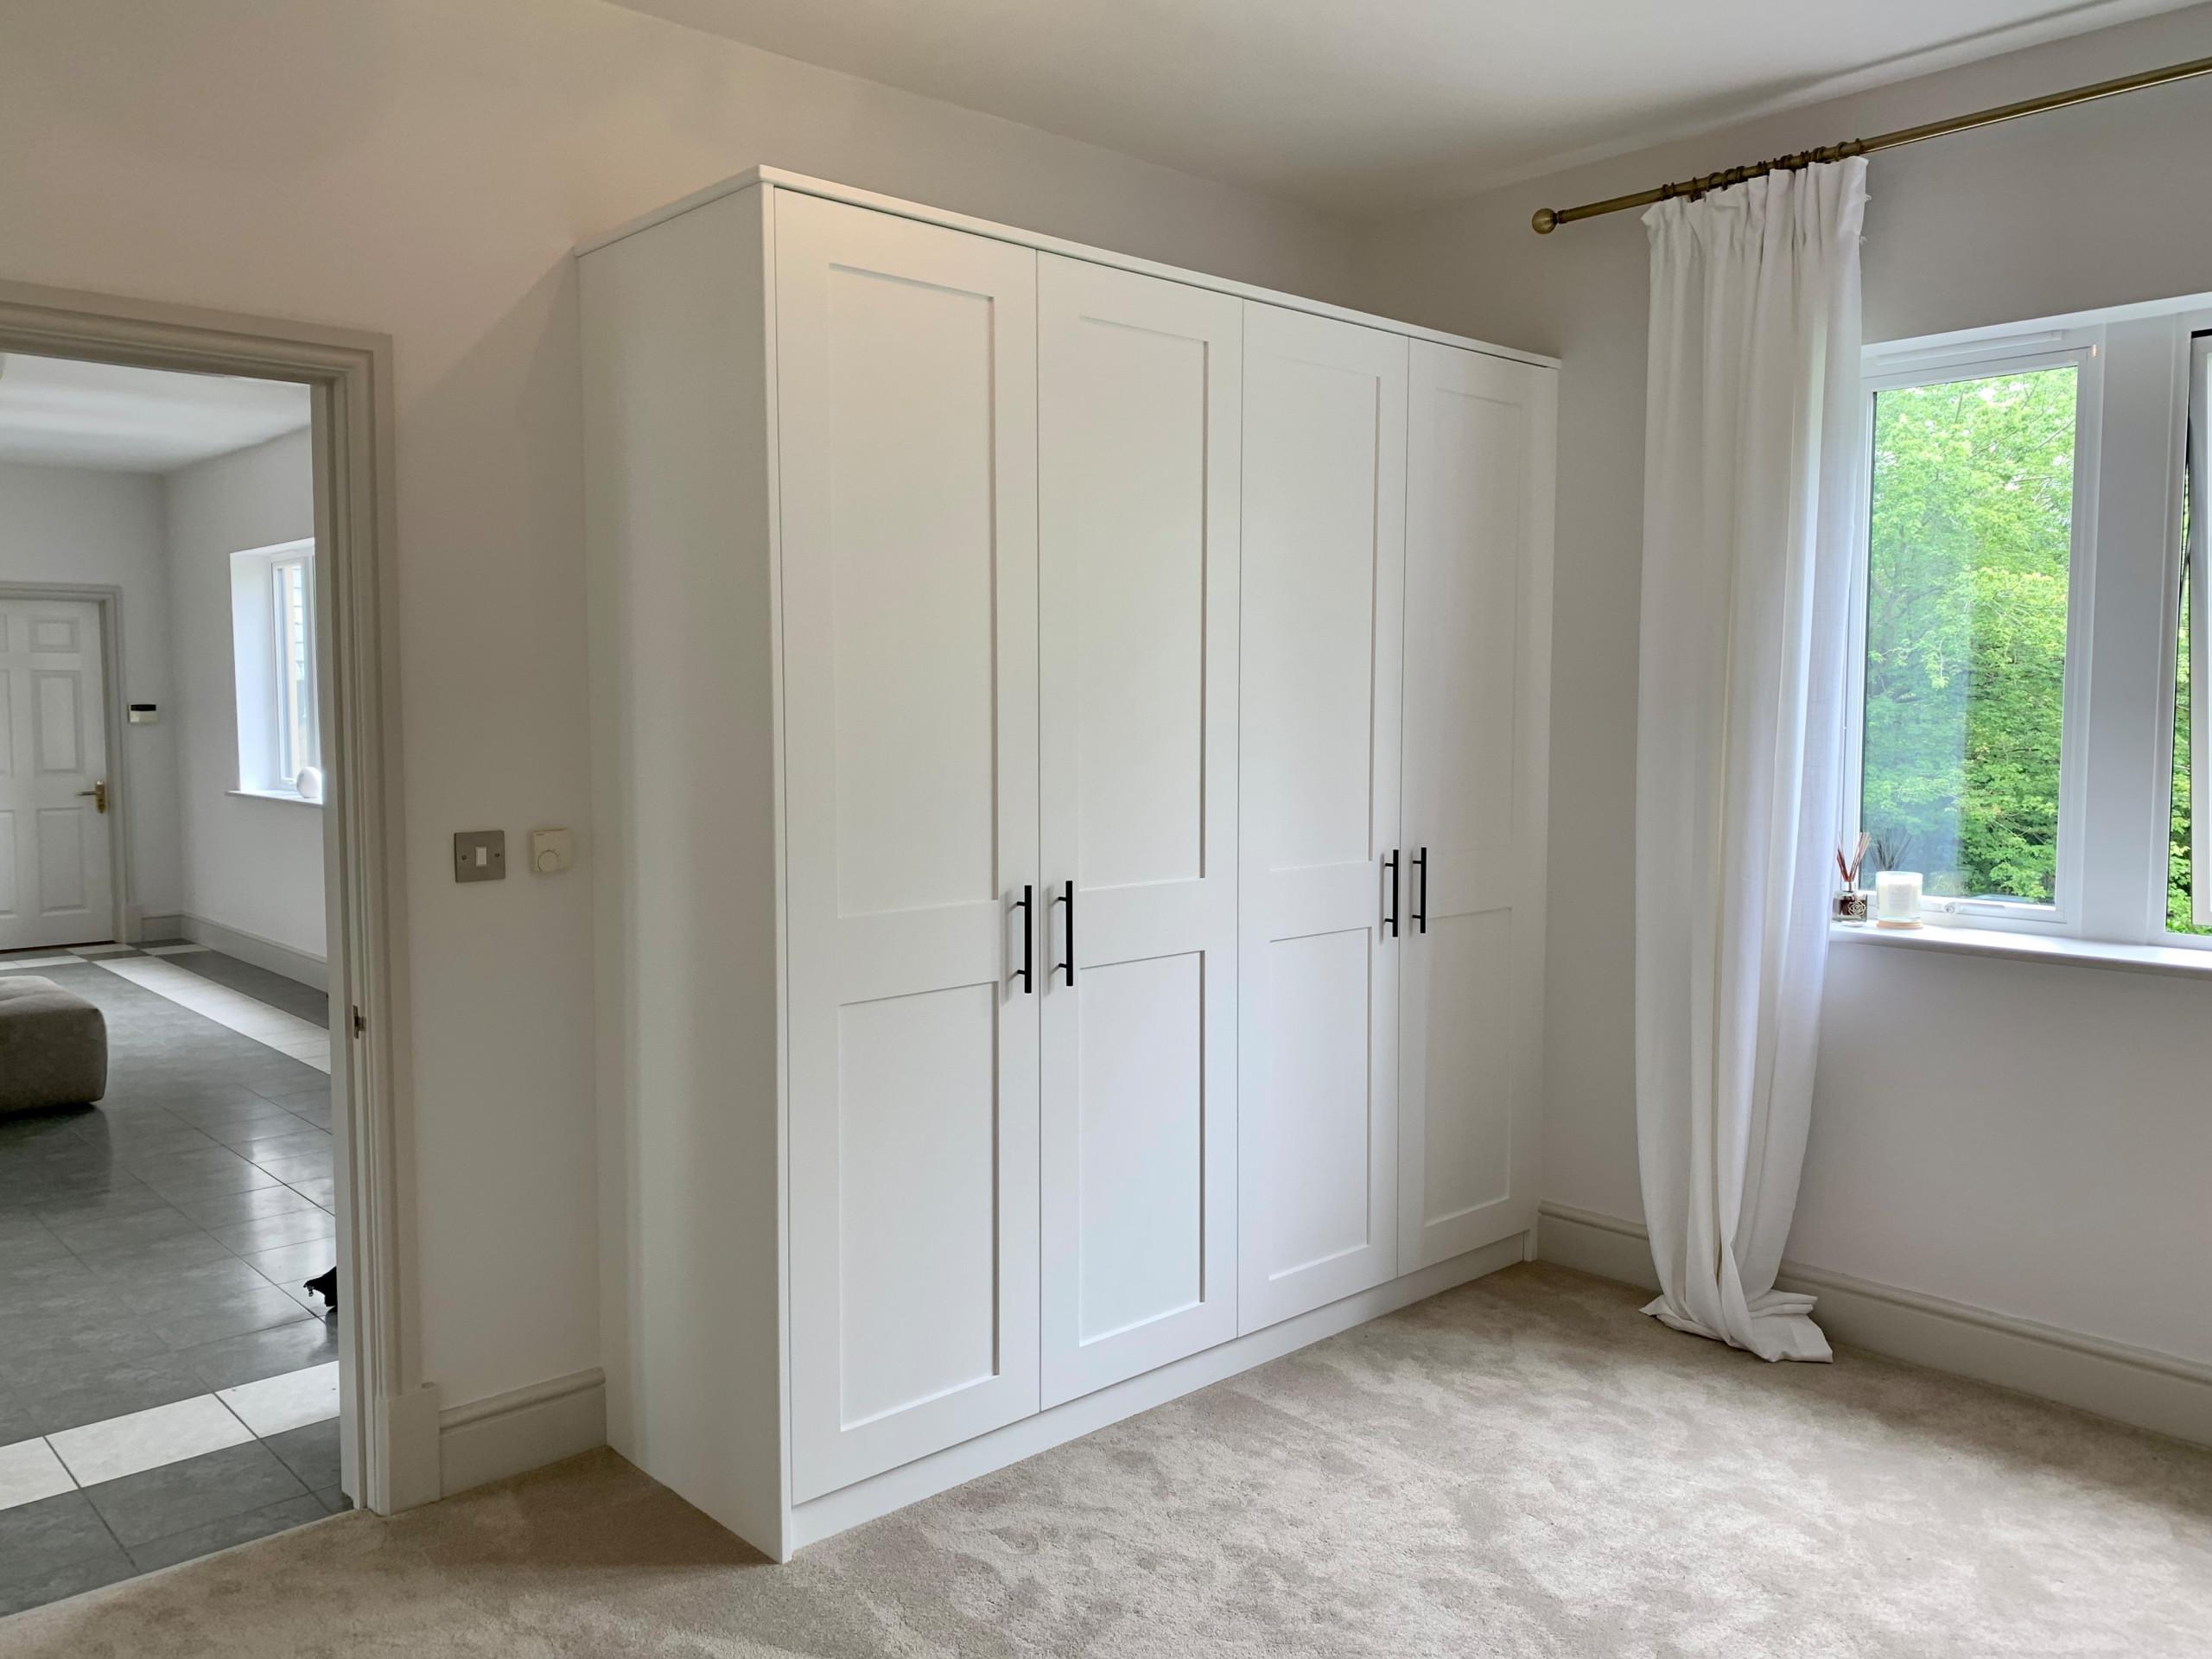 Brilliant white spray painted shaker door style